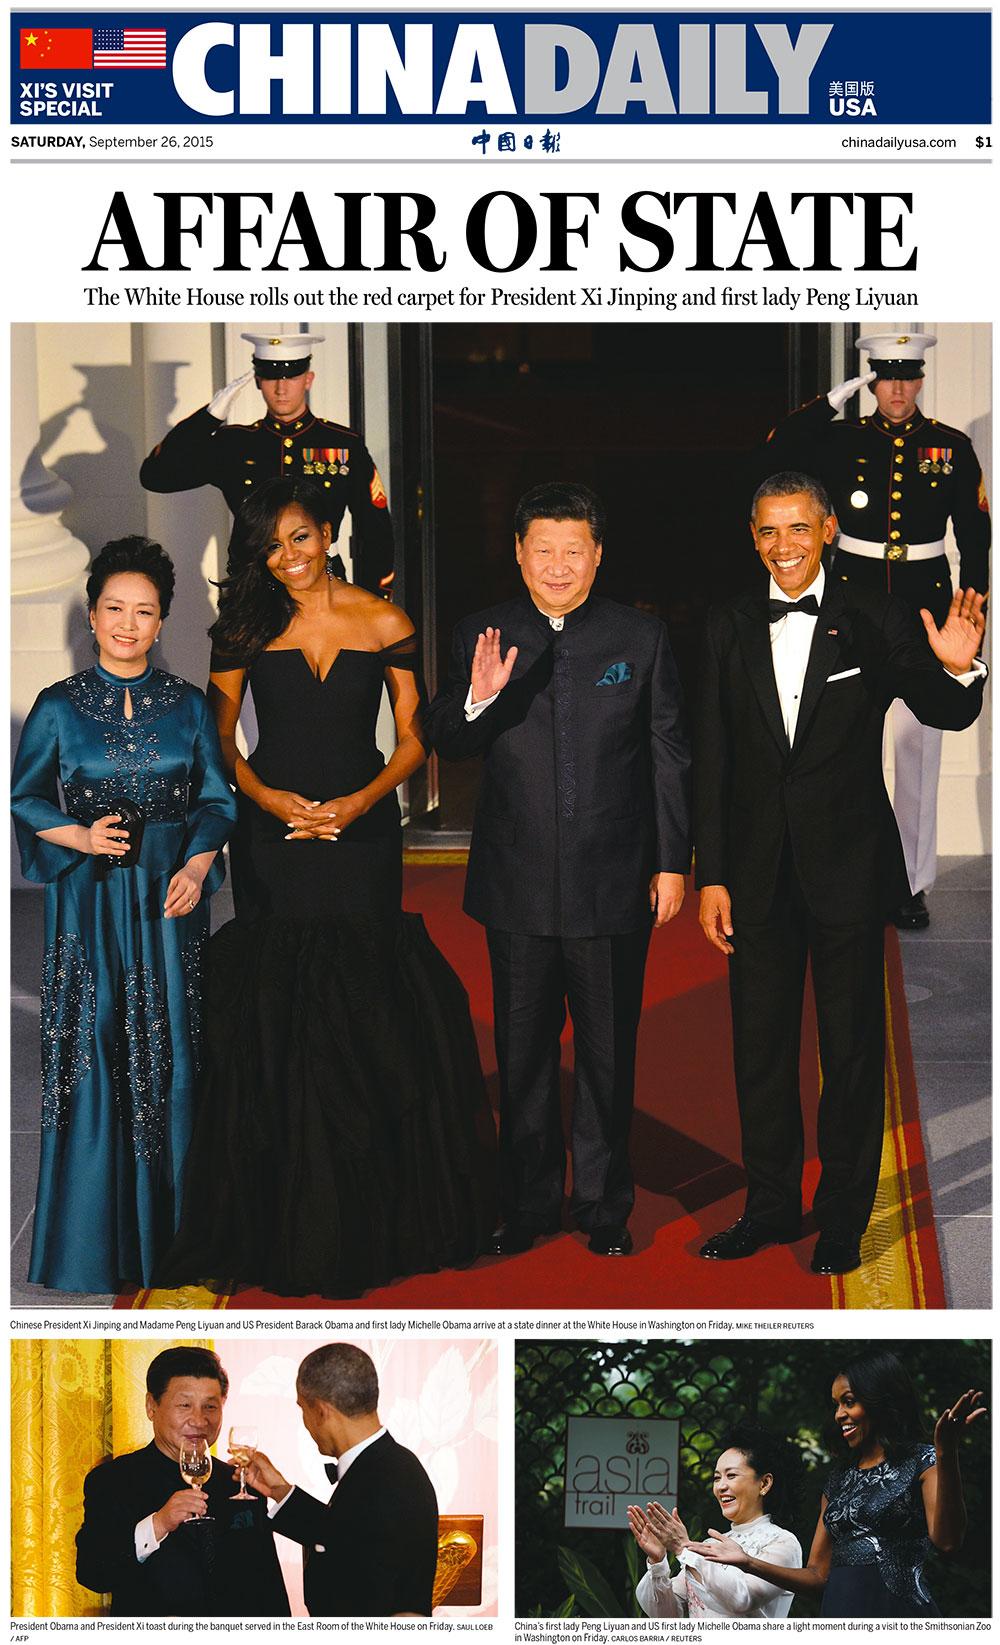 'China Daily,' U.S. edition, September 26, 2015.